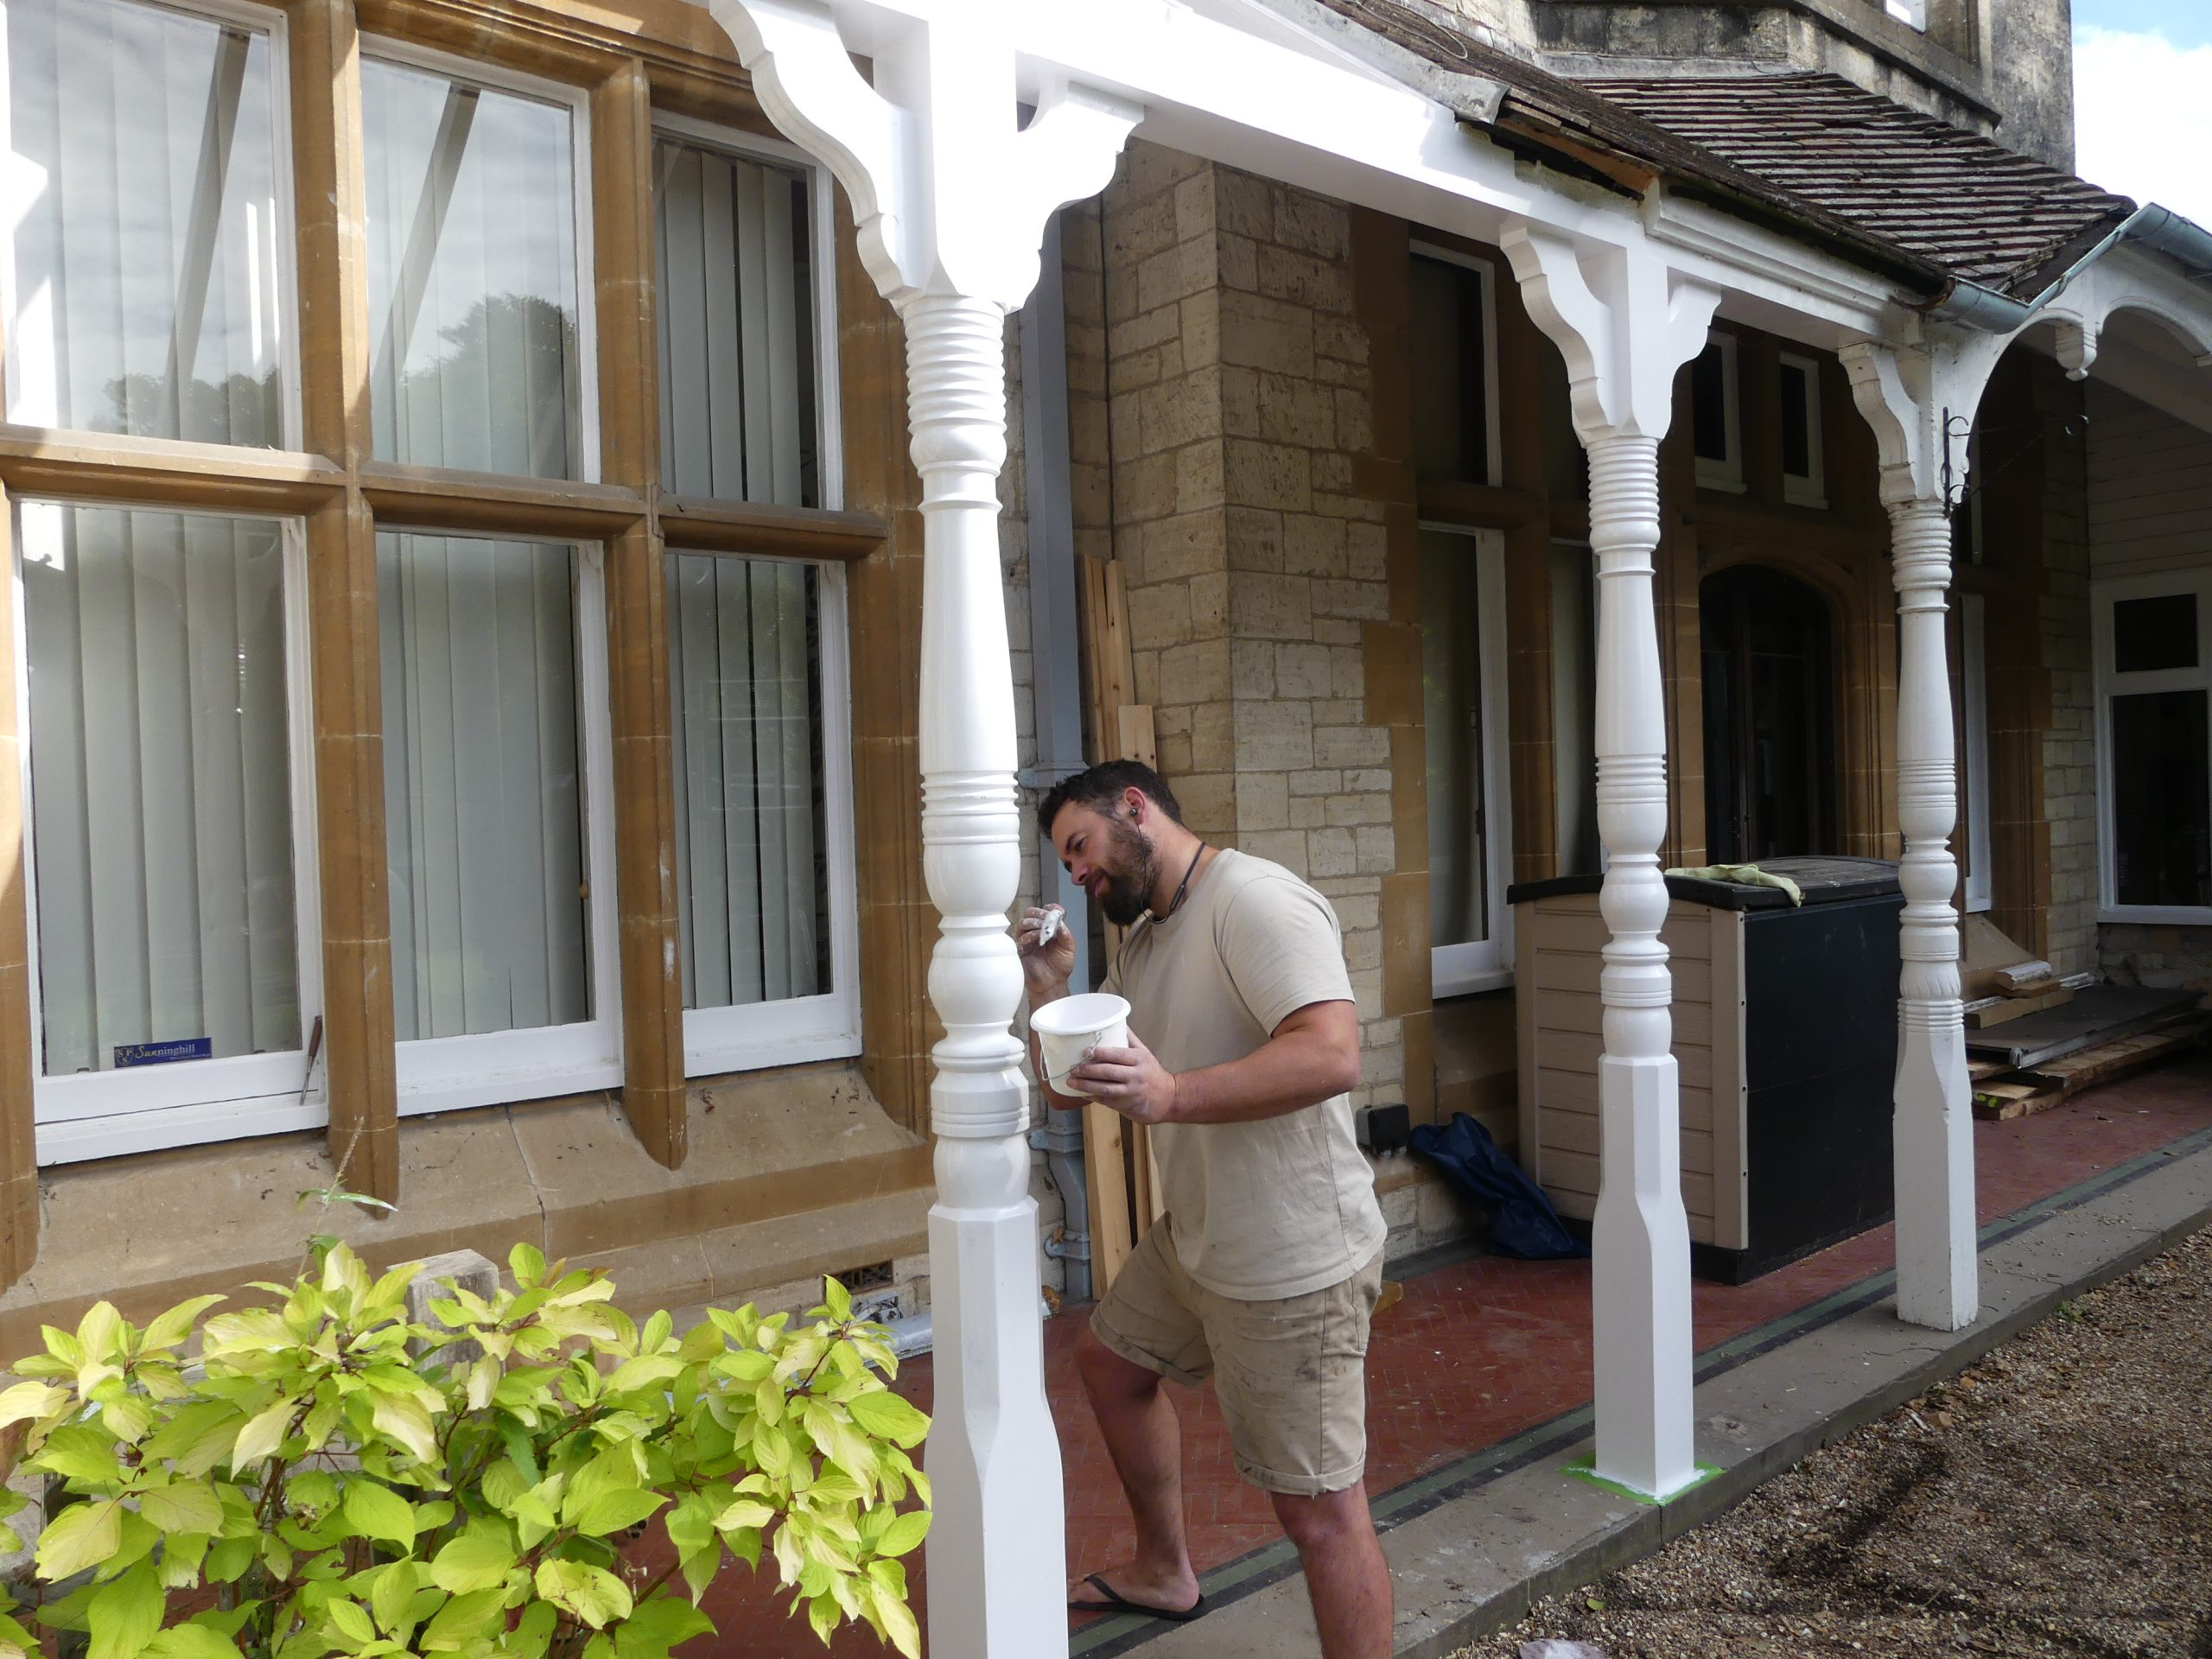 Repairing the verandah